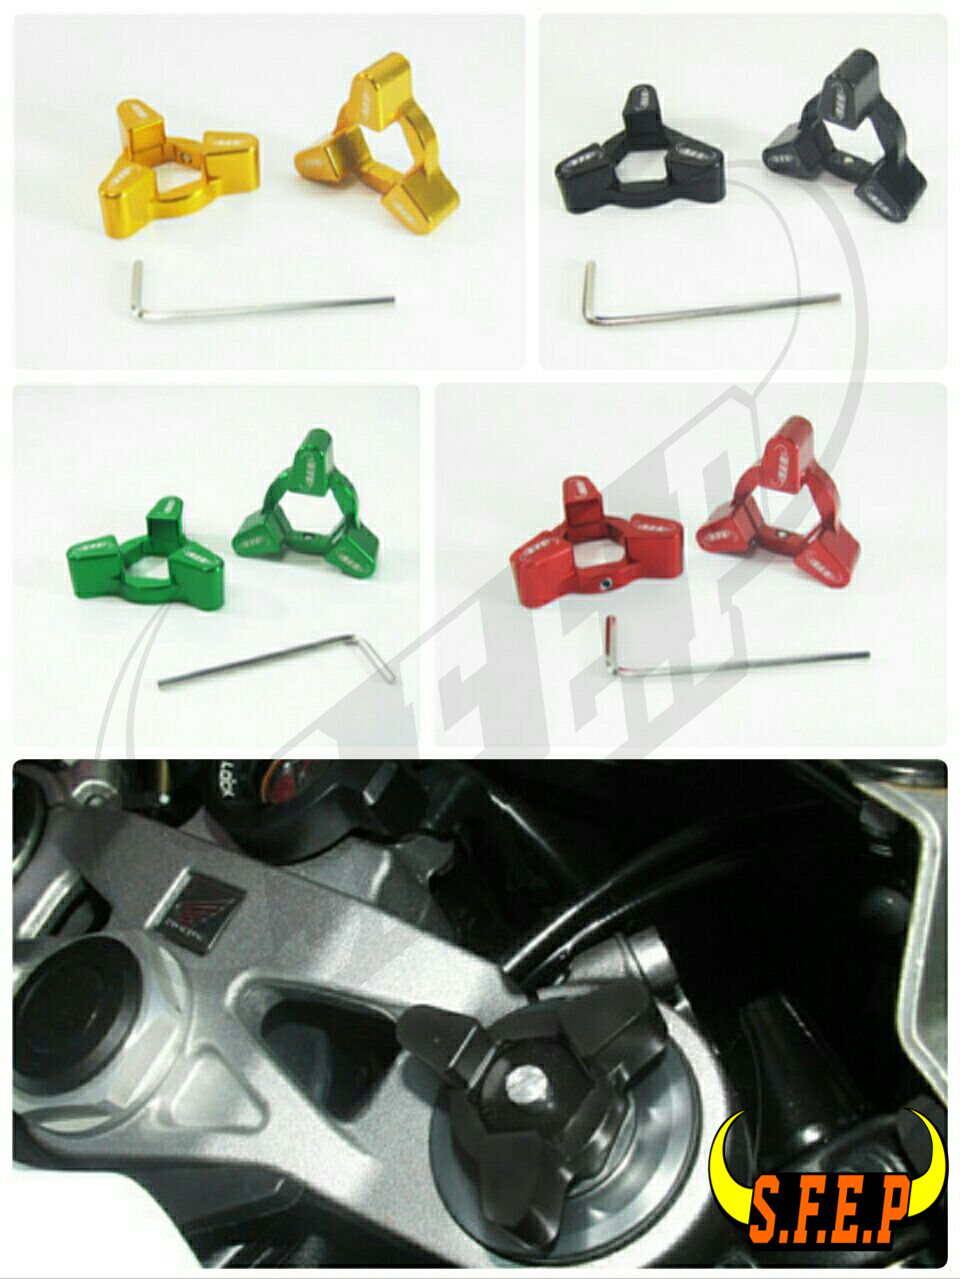 Motorcycle CNC Fork Preload Adjusters For Suzuki TL1000S 97-01/ TL1000R 98-03